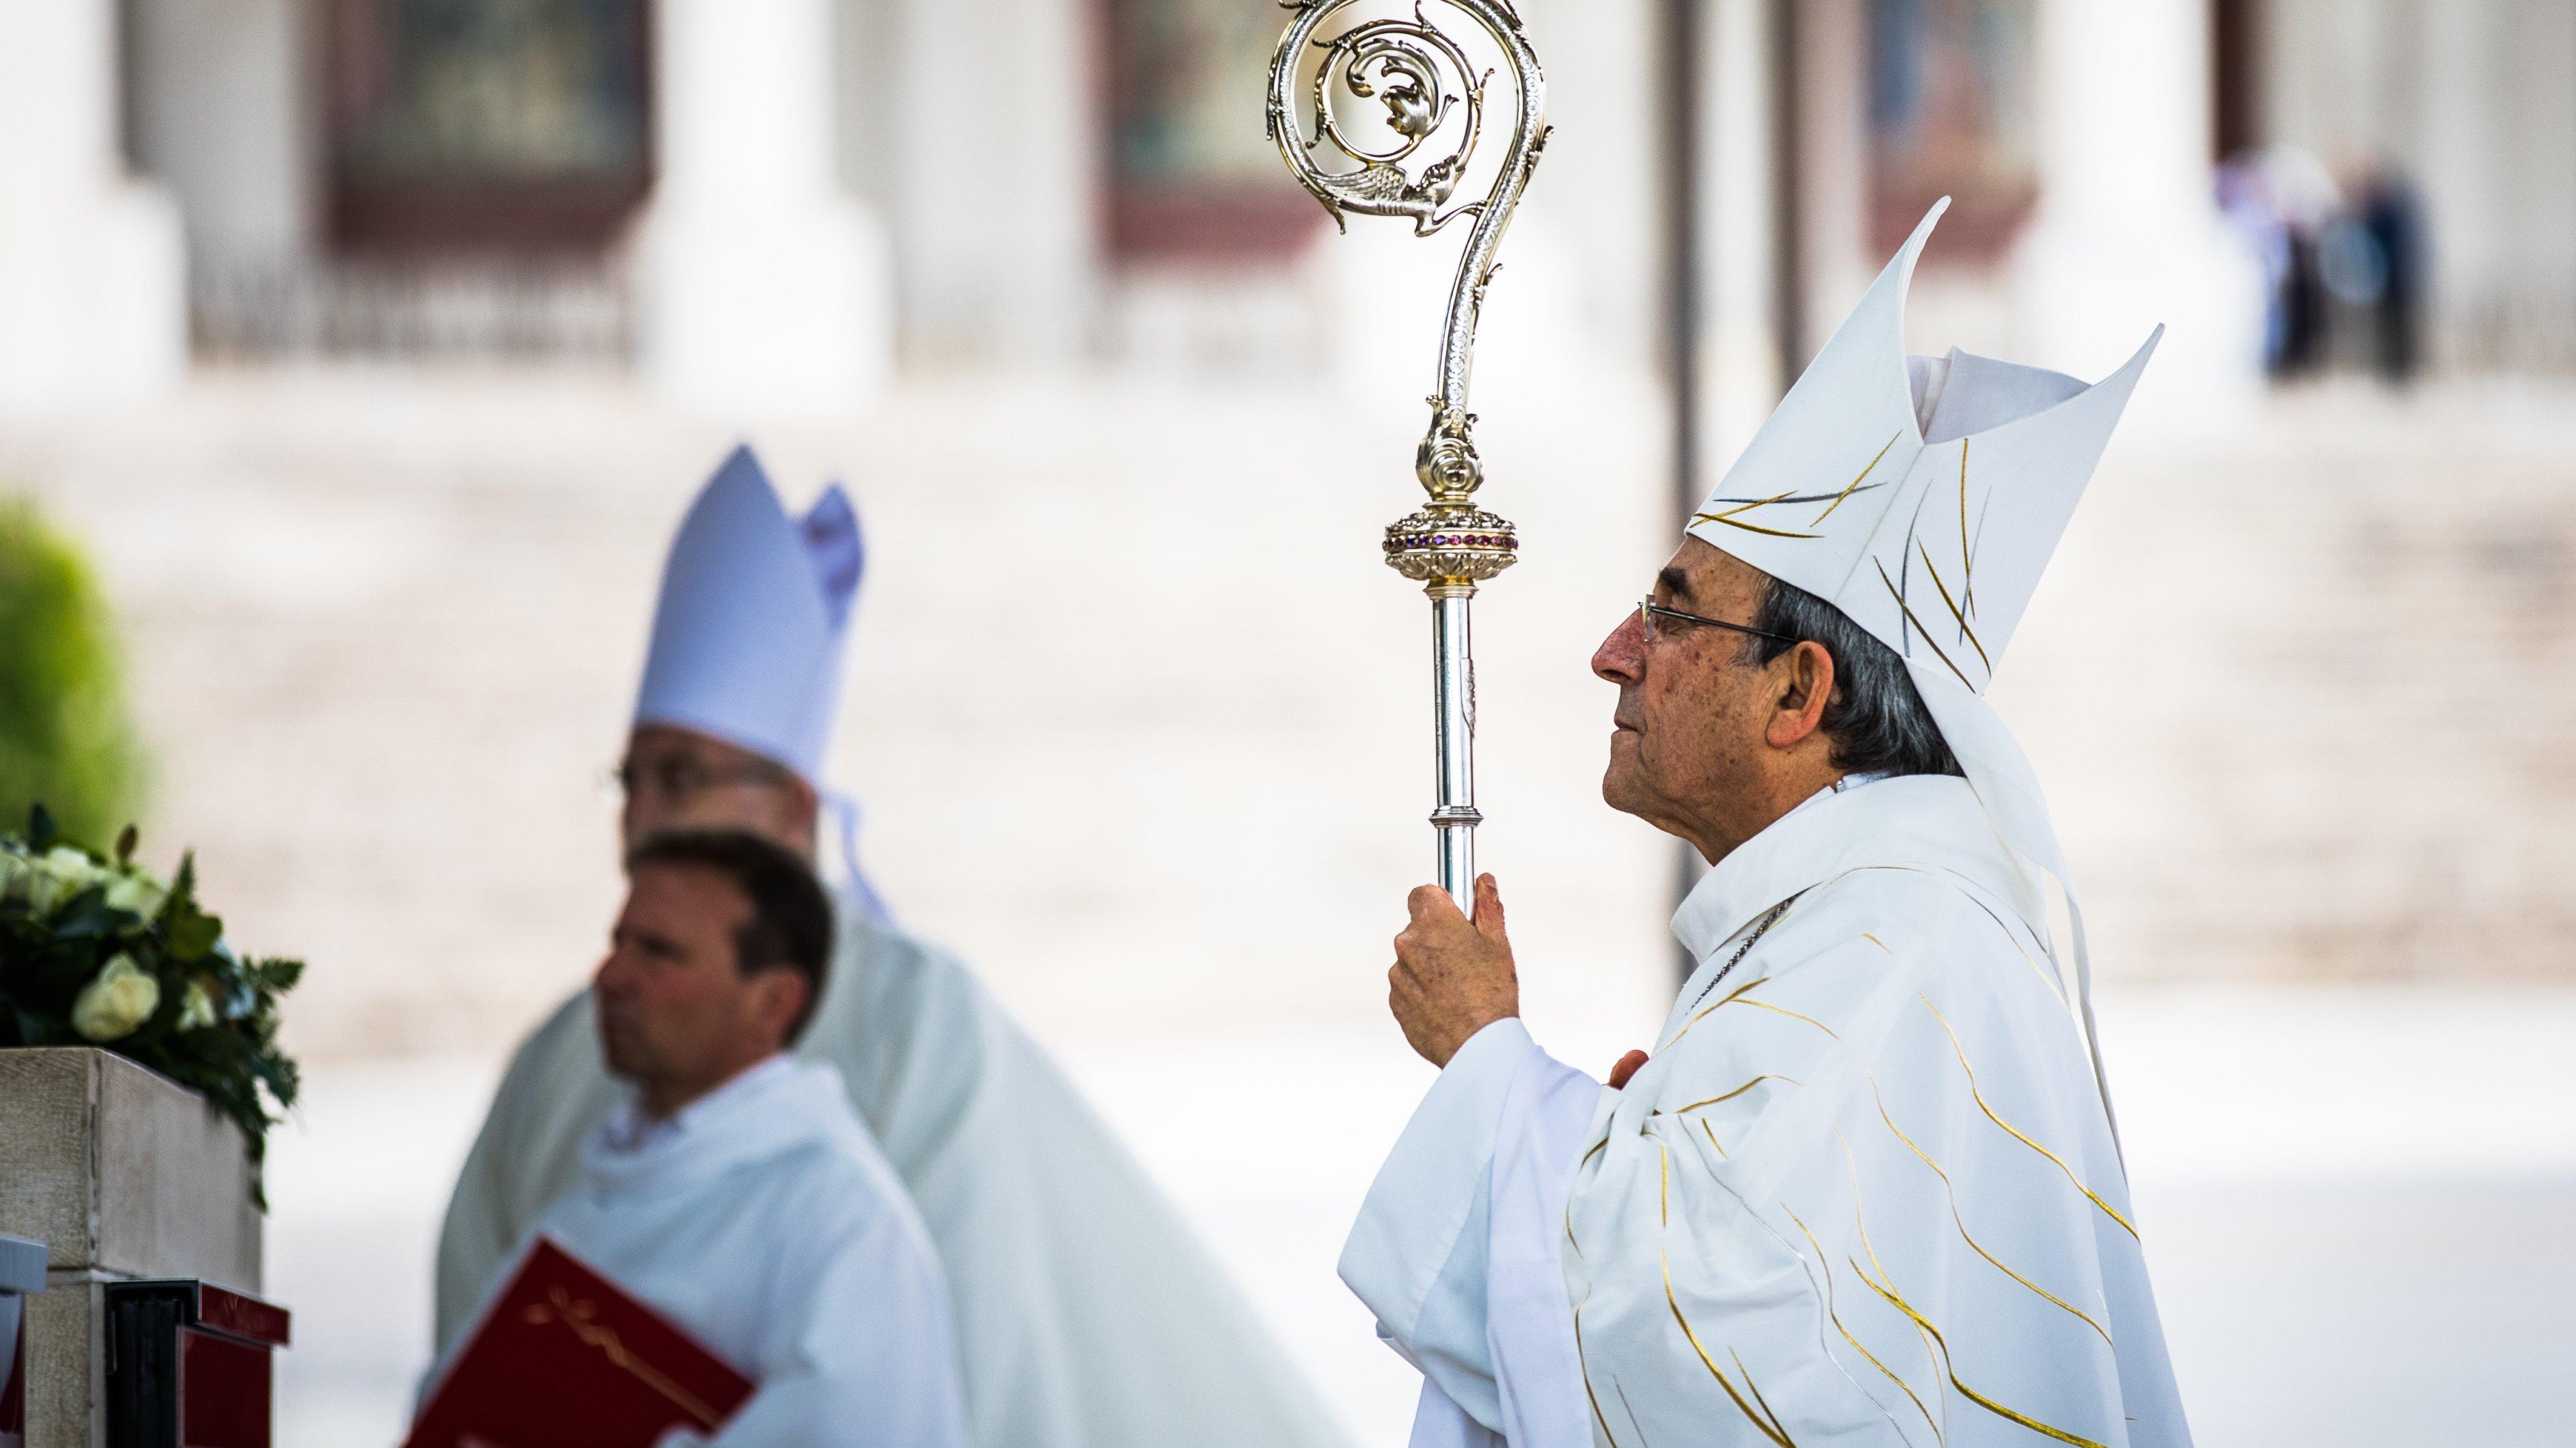 Bishop of Leiria-Fatima, Dom Antonio Cardeal Marto leads the